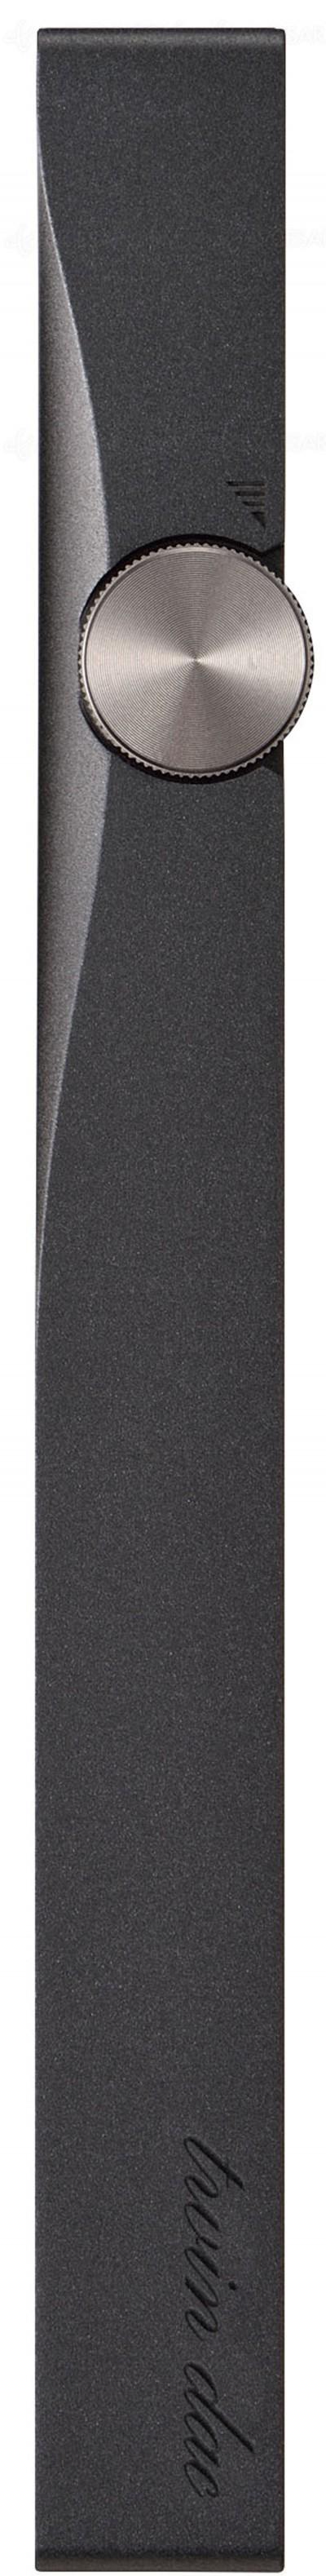 Onkyo XD-P1 : lecteur portable Hi-Res Audio